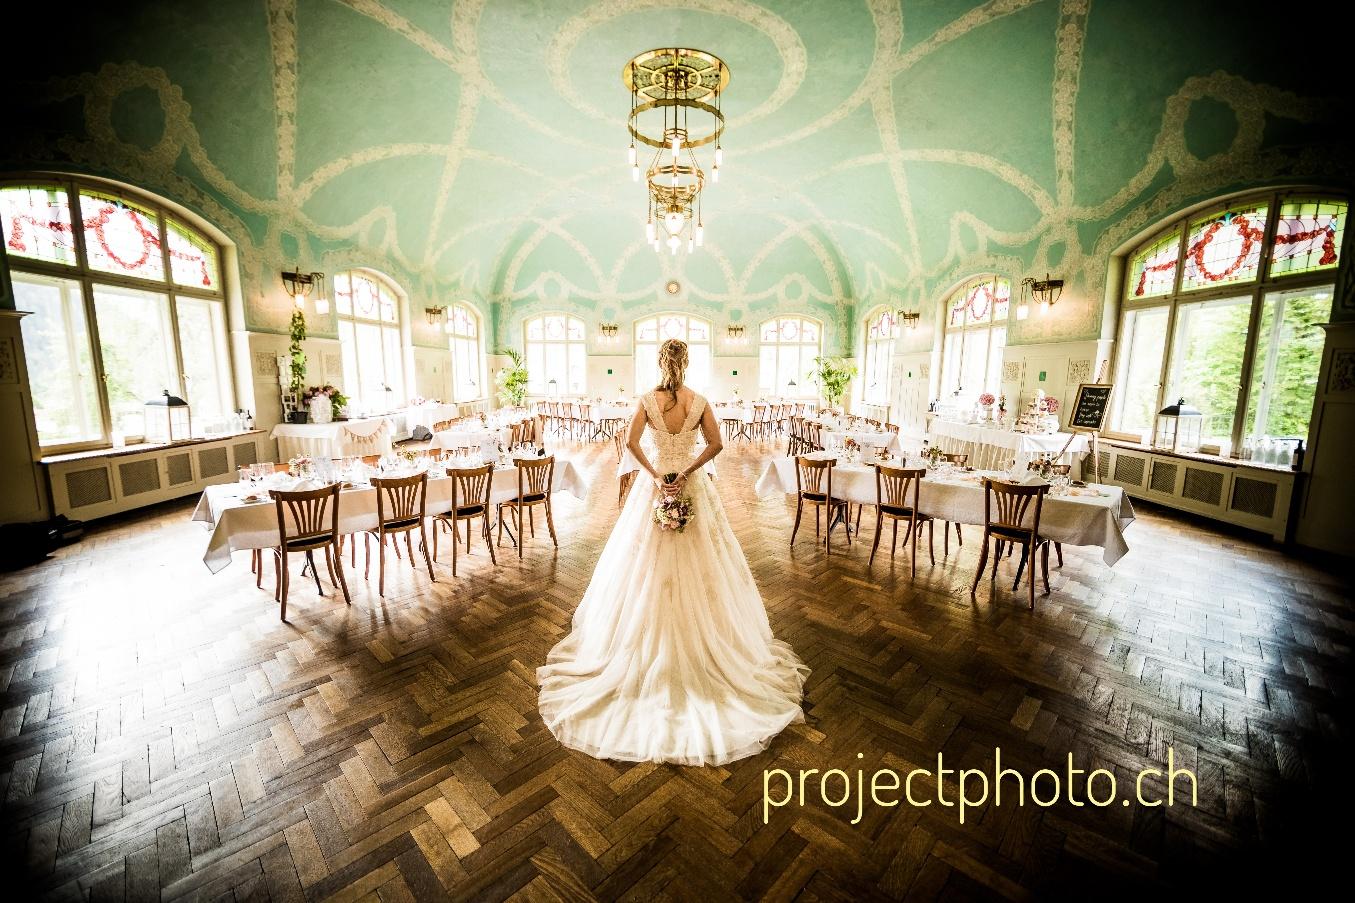 Hochzeit DJ Projectphoto Hochzeit Foto